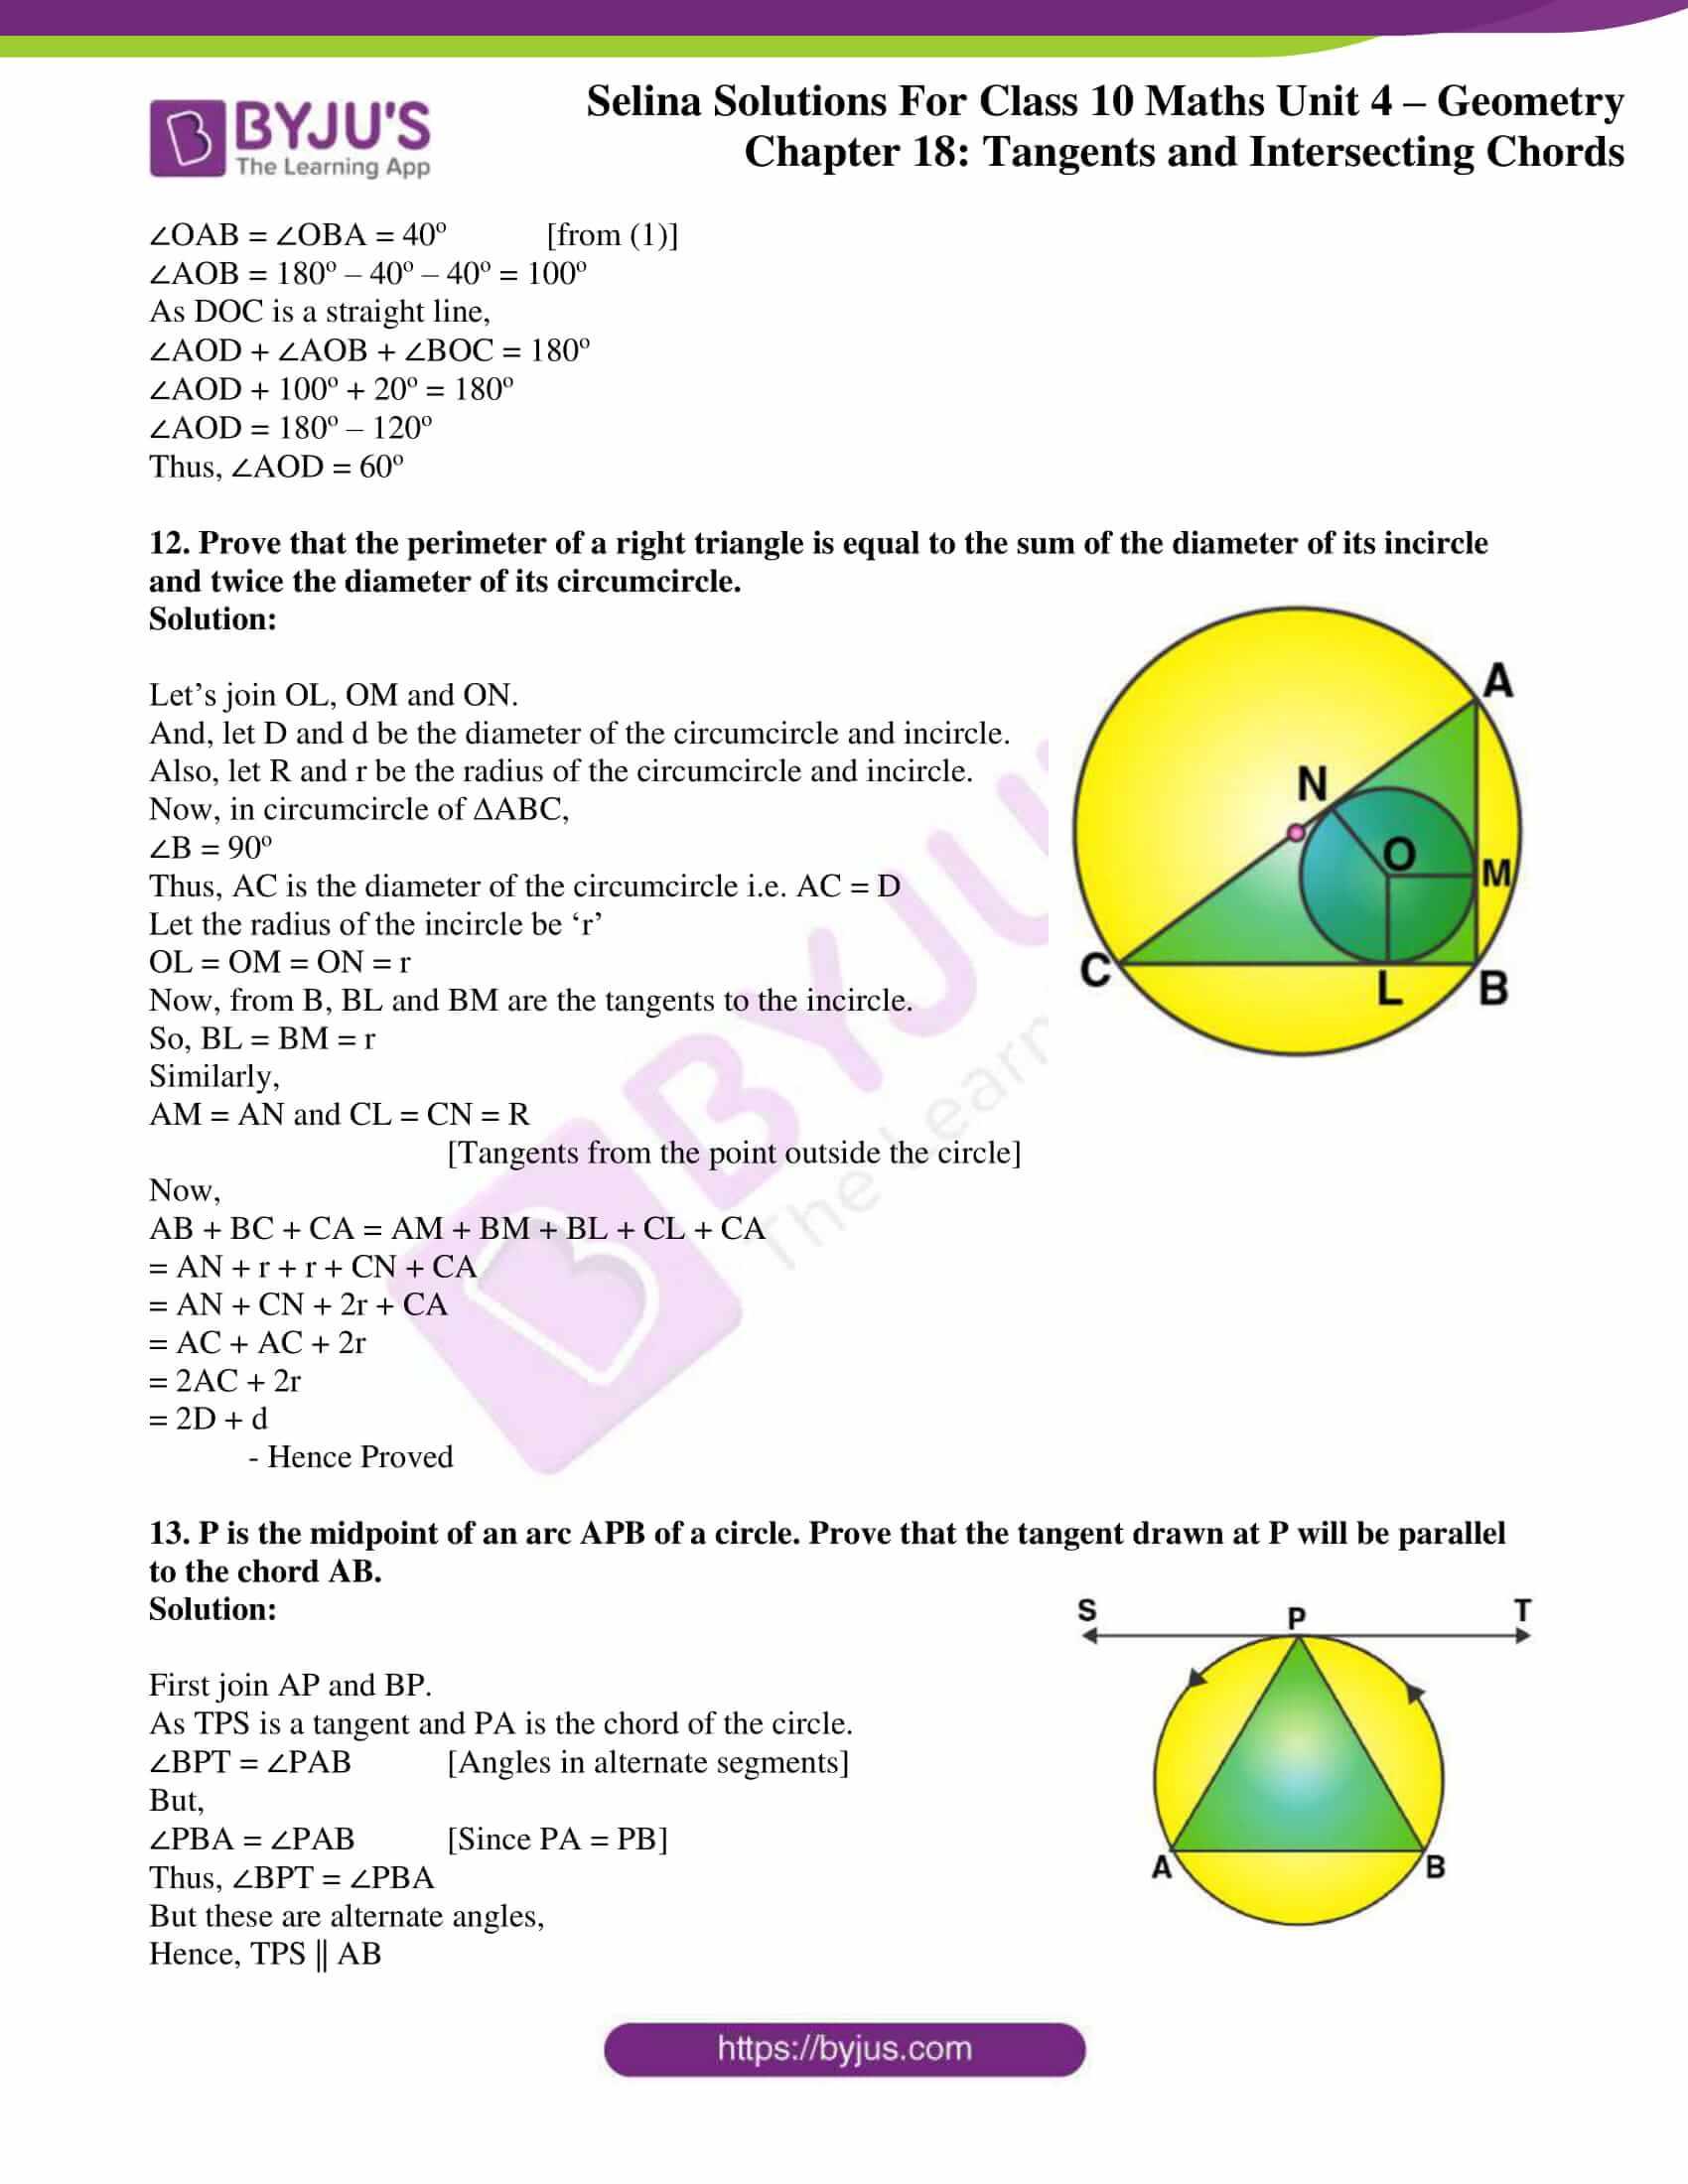 selina-sol-maths-class-10-ch-18-ex-c-07